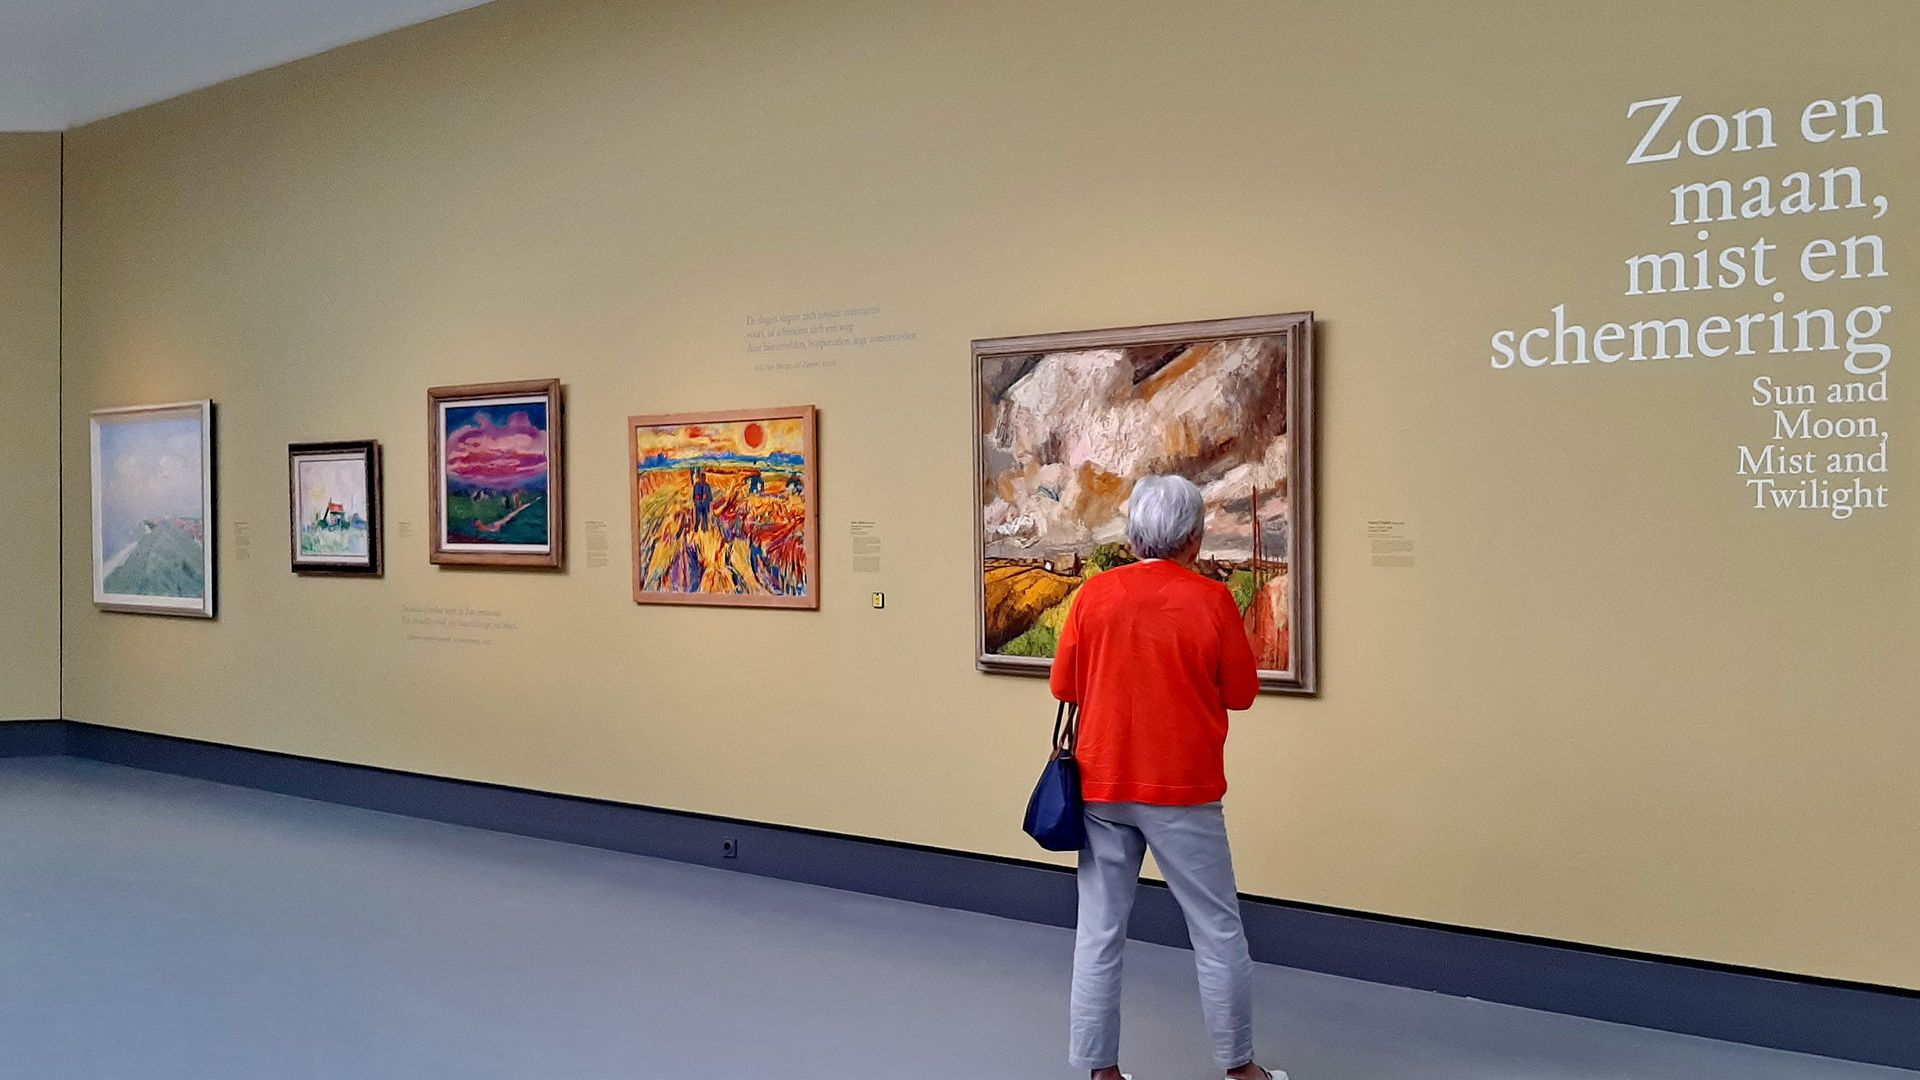 Singer Laren Museum: Skip The Line